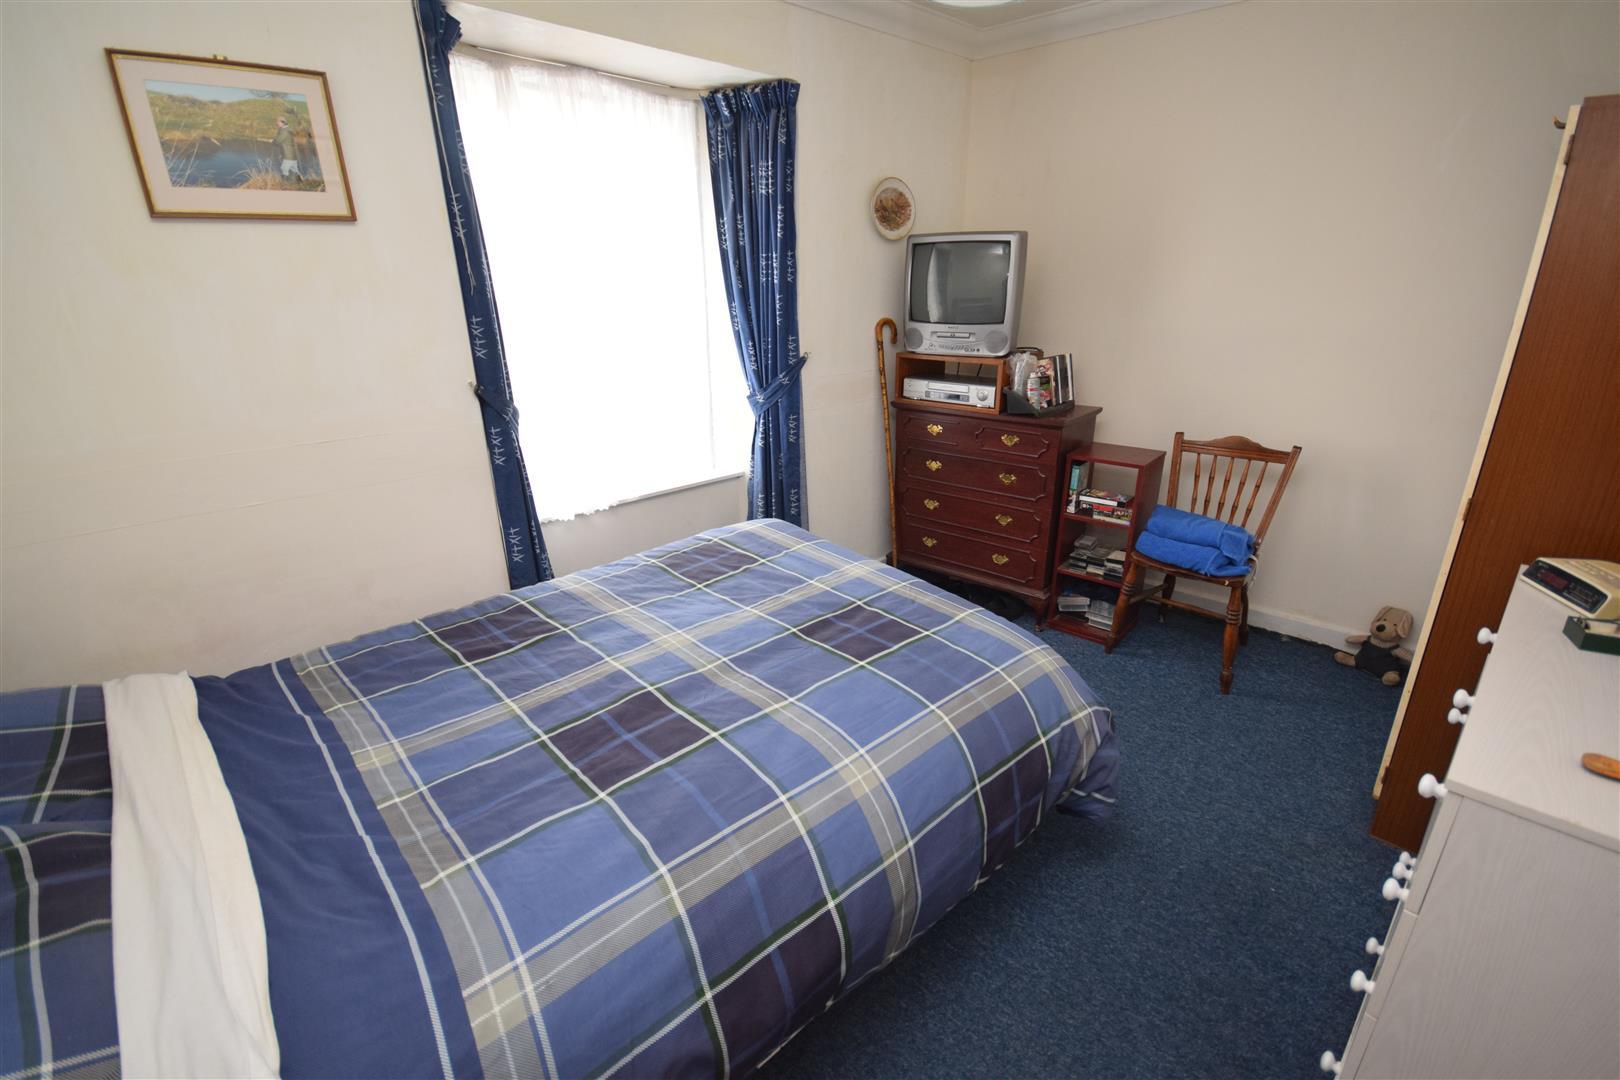 40, Townhead, Auchterarder, Perthshire, PH3 1AH, UK